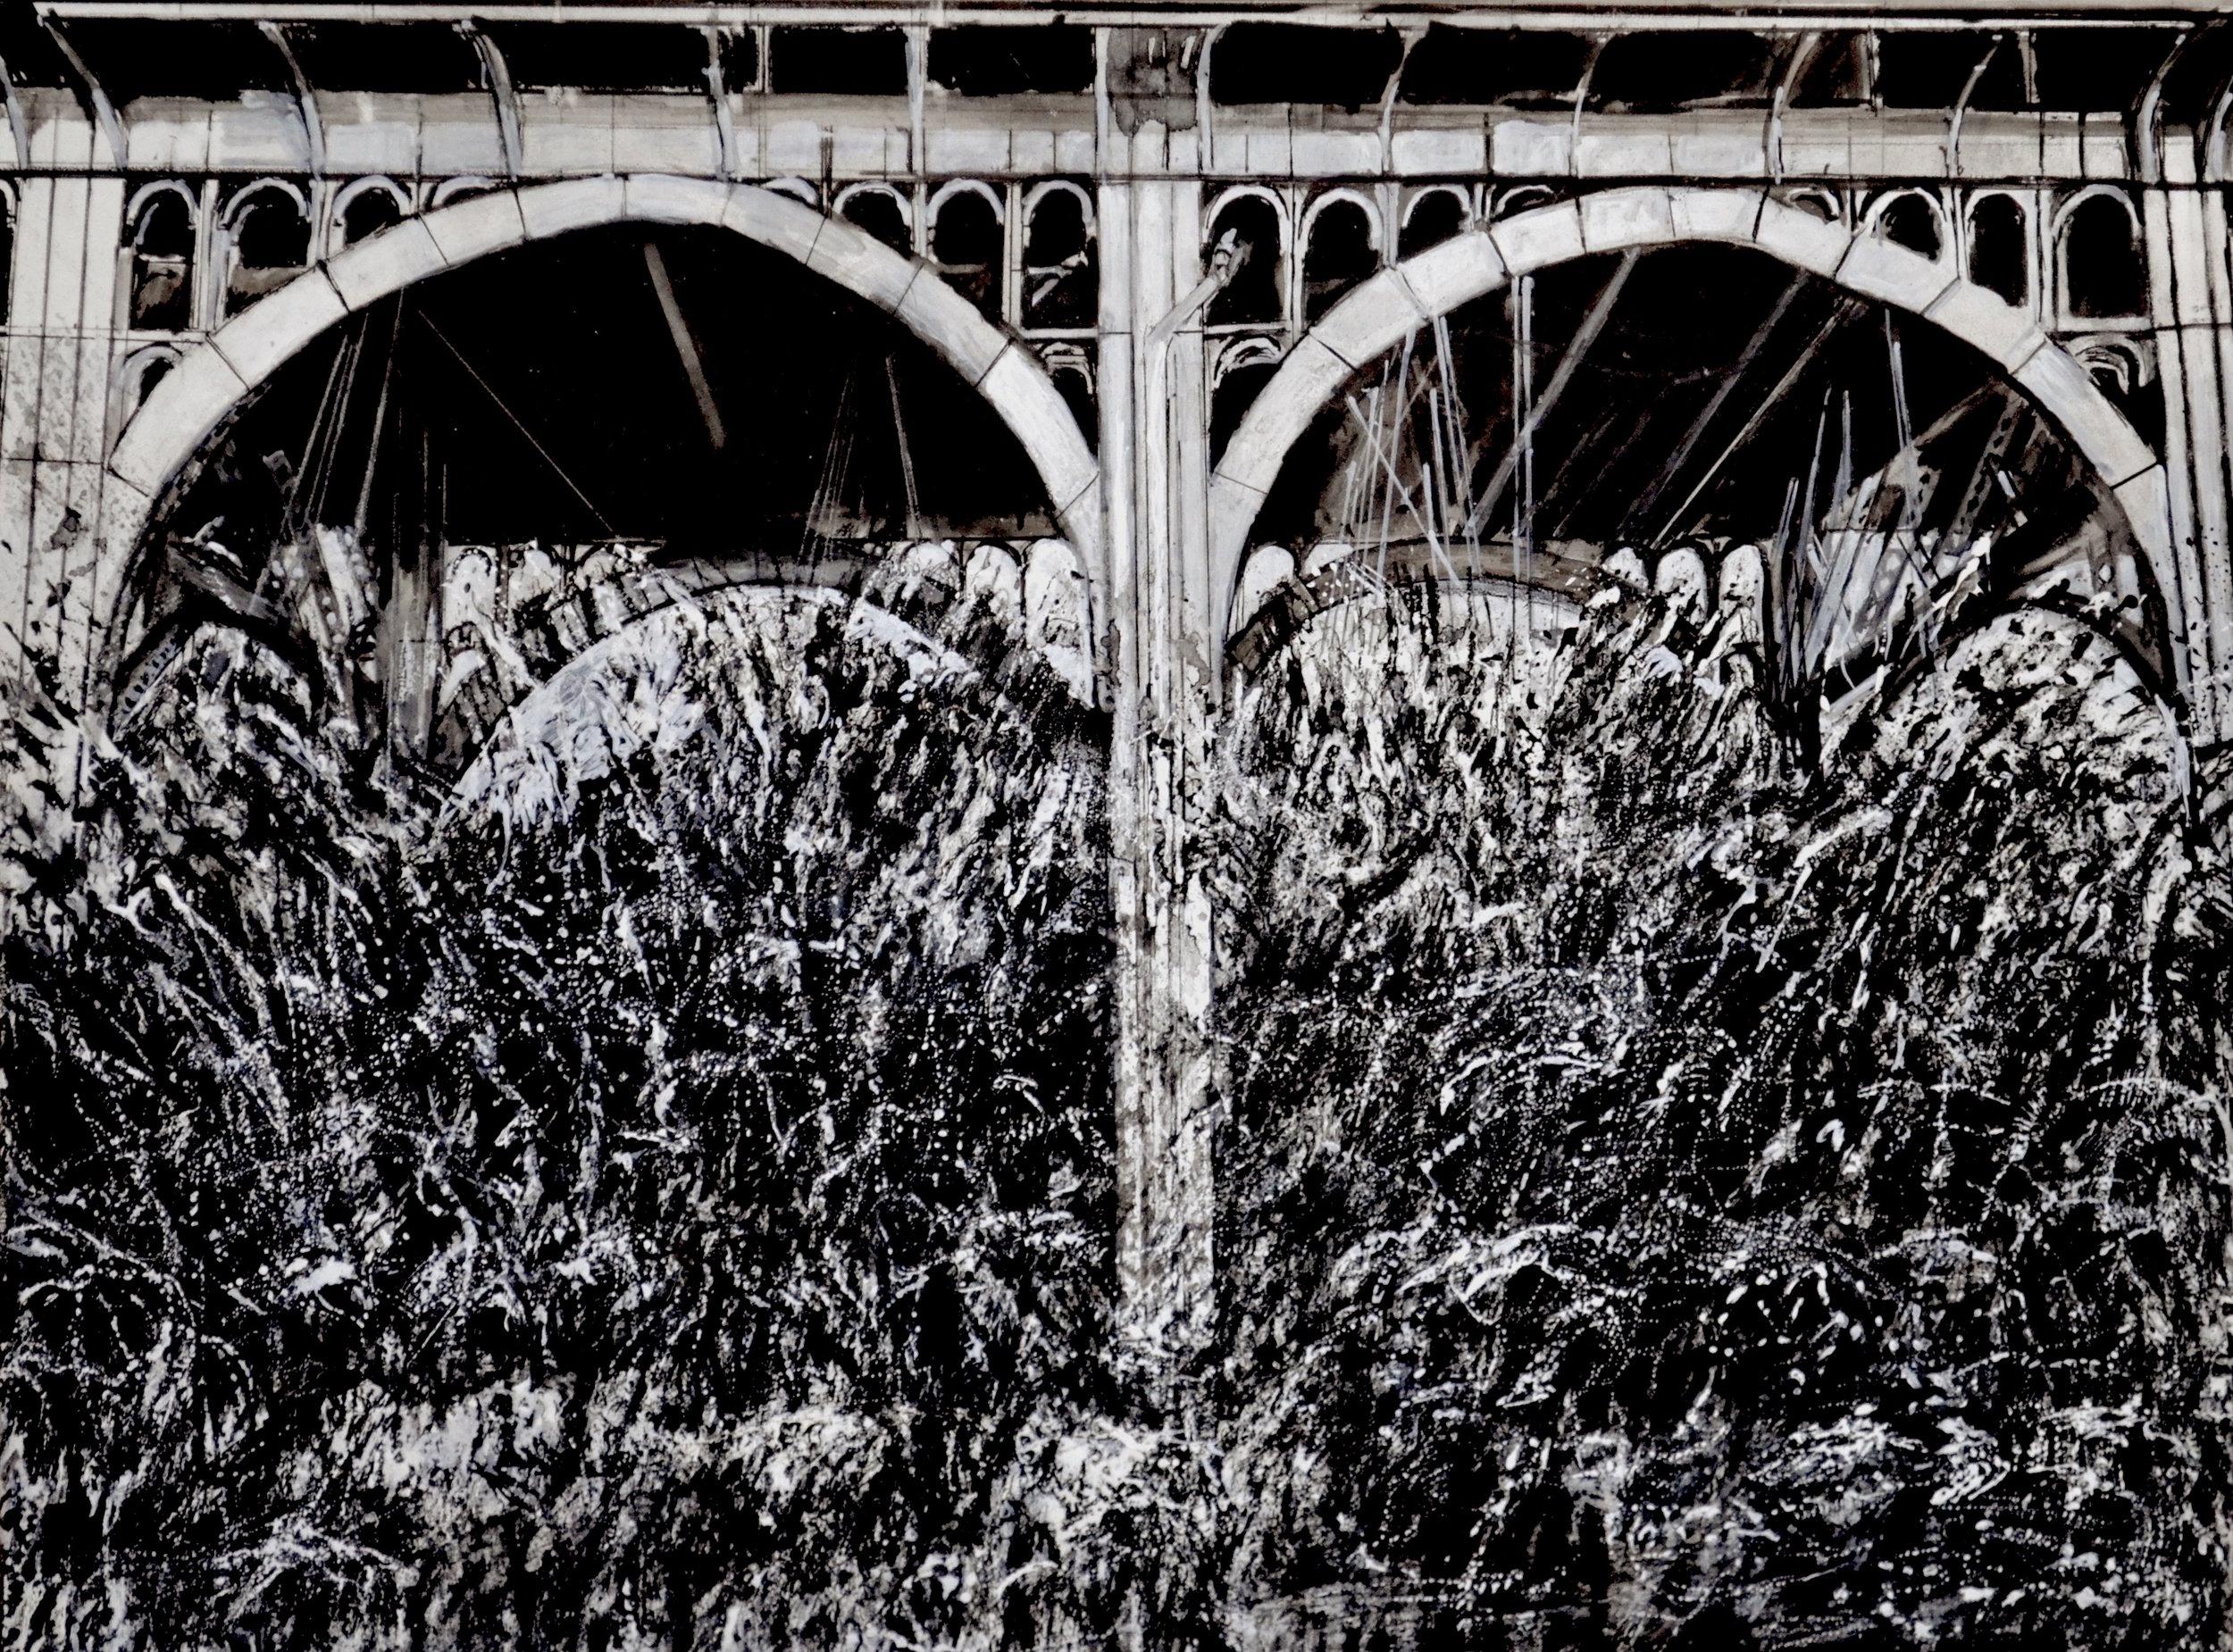 Trestle Bridge, 126th St.